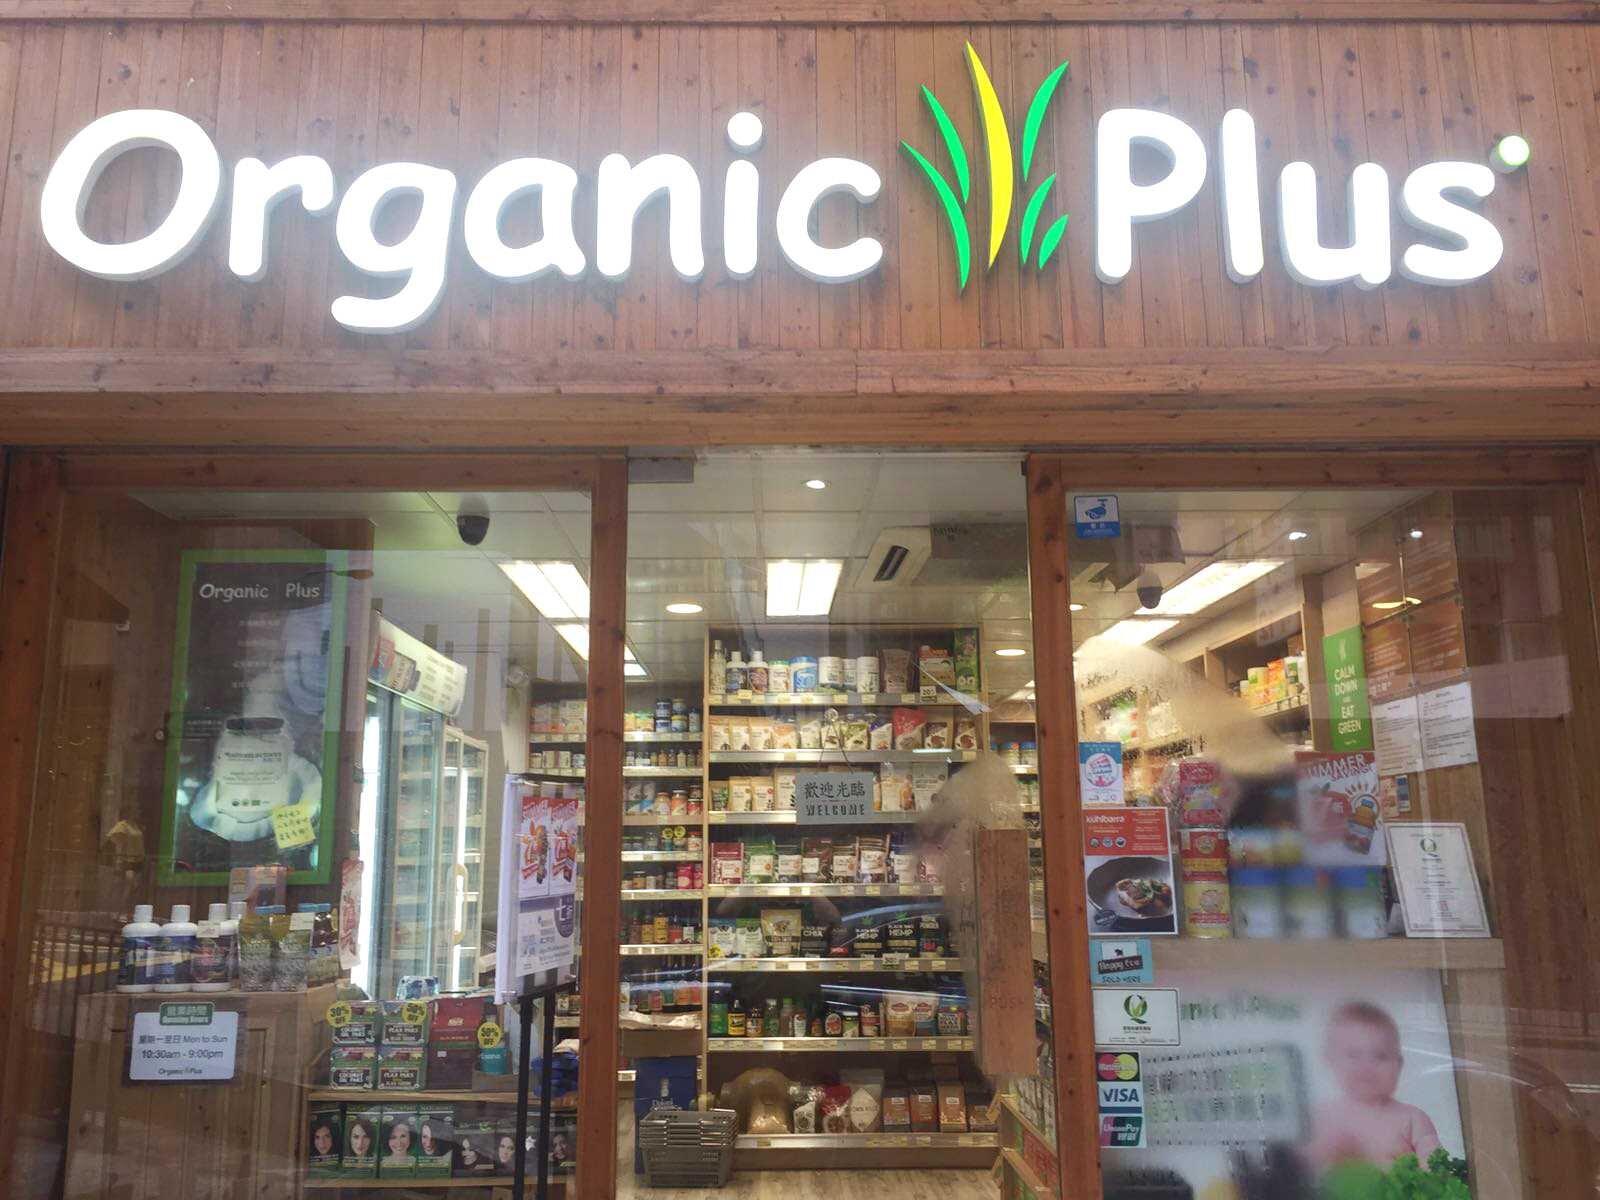 Organic Plus   Central Shop  Business Hours:10:30am-8:30pm  Mobile:2530 1128  Email:caine@organicplus.com.hk  Address:G/F, 79 Caine Road,  Central, H.K.